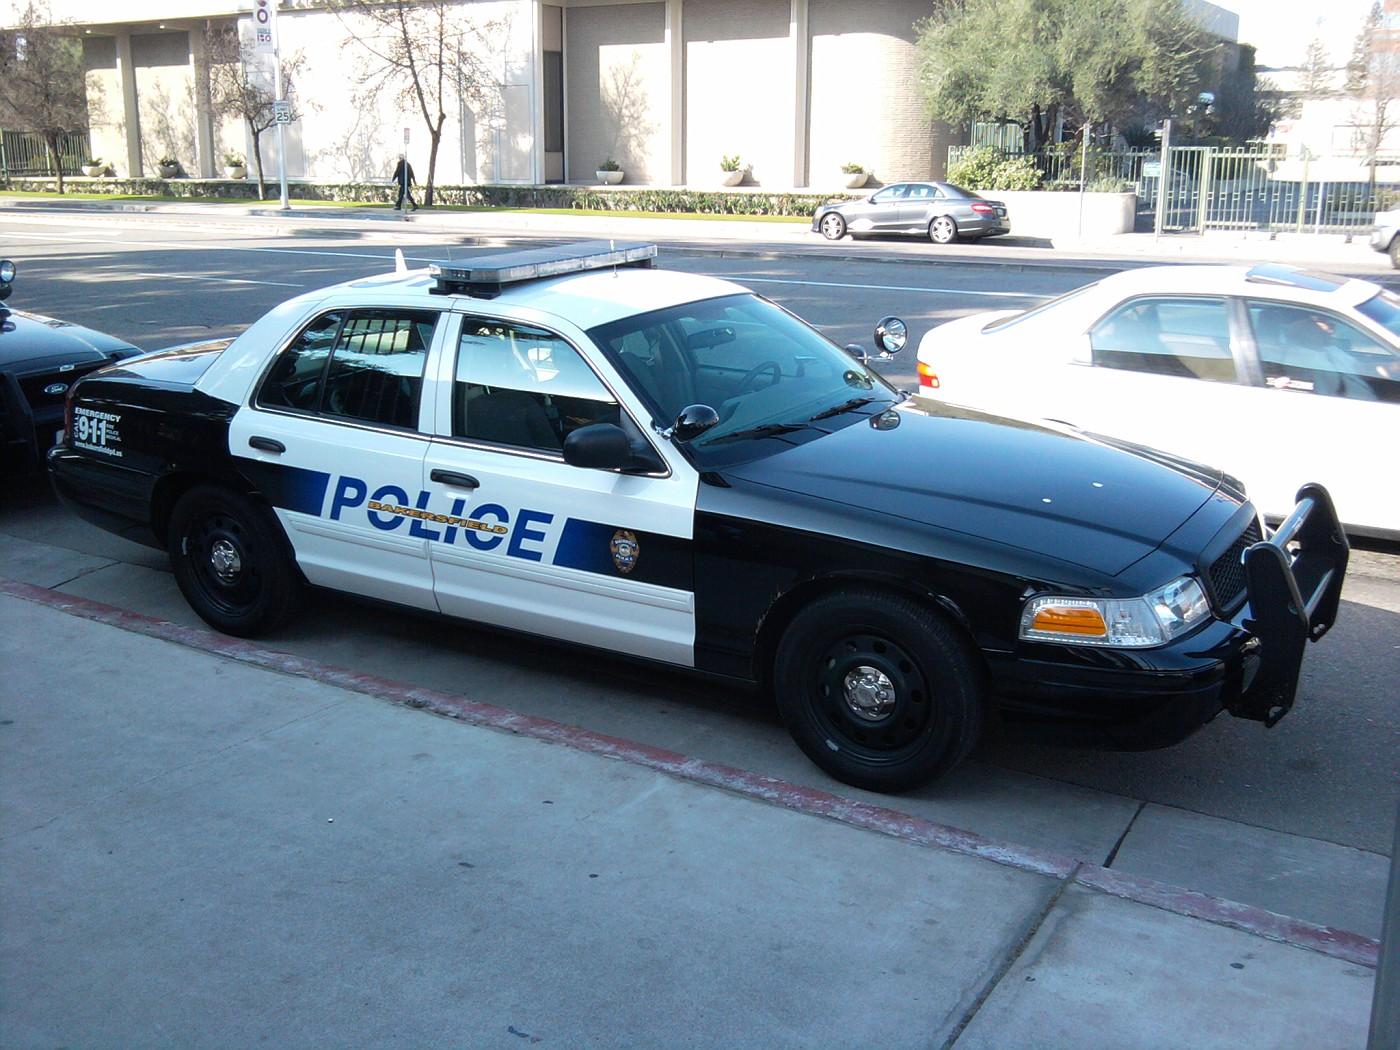 CA - Bakersfield Police